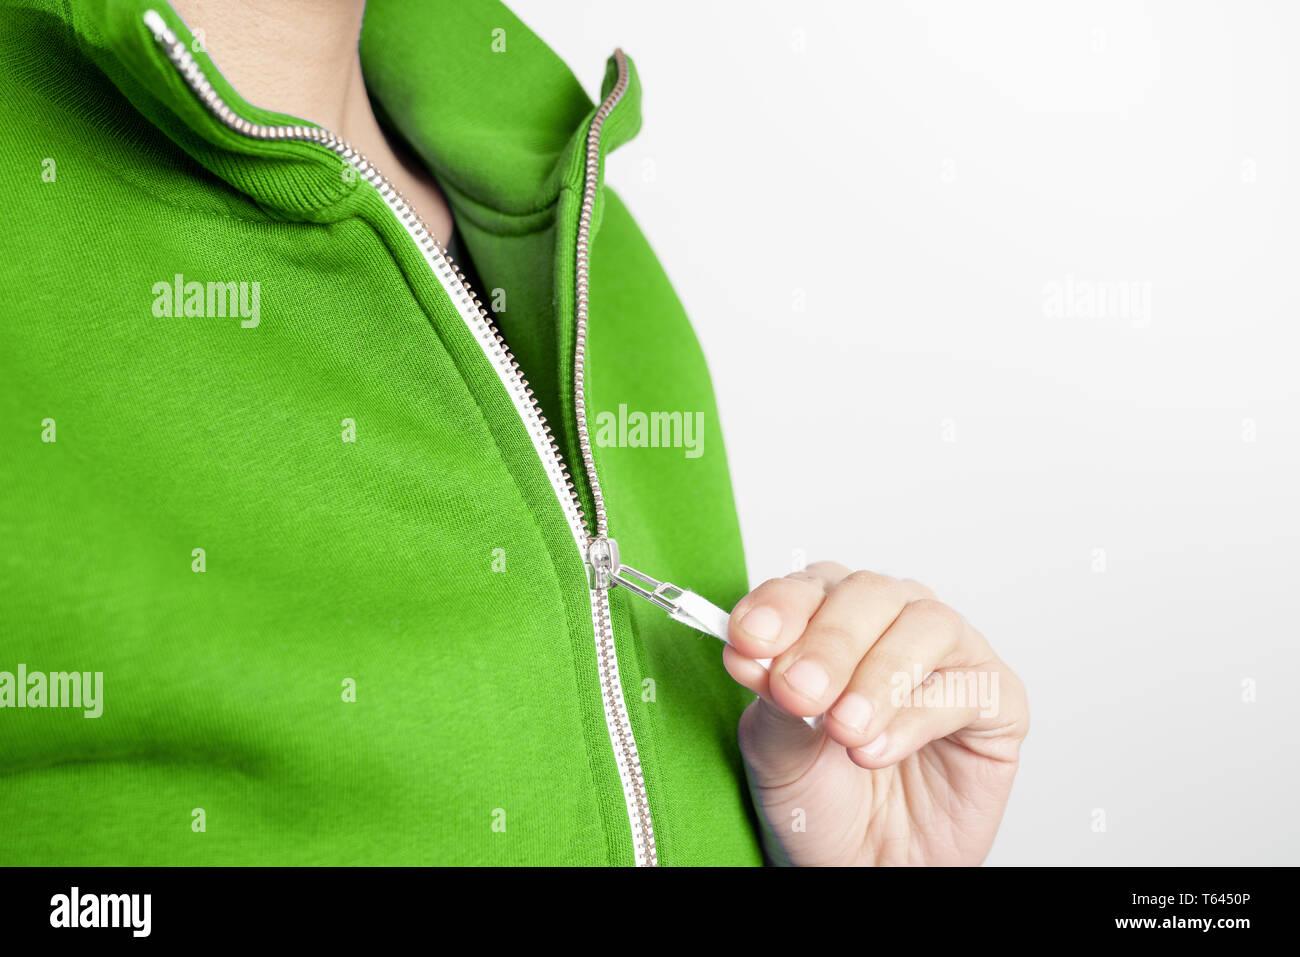 Grüne Sweatjacke Stockfotos & Grüne Sweatjacke Bilder Alamy